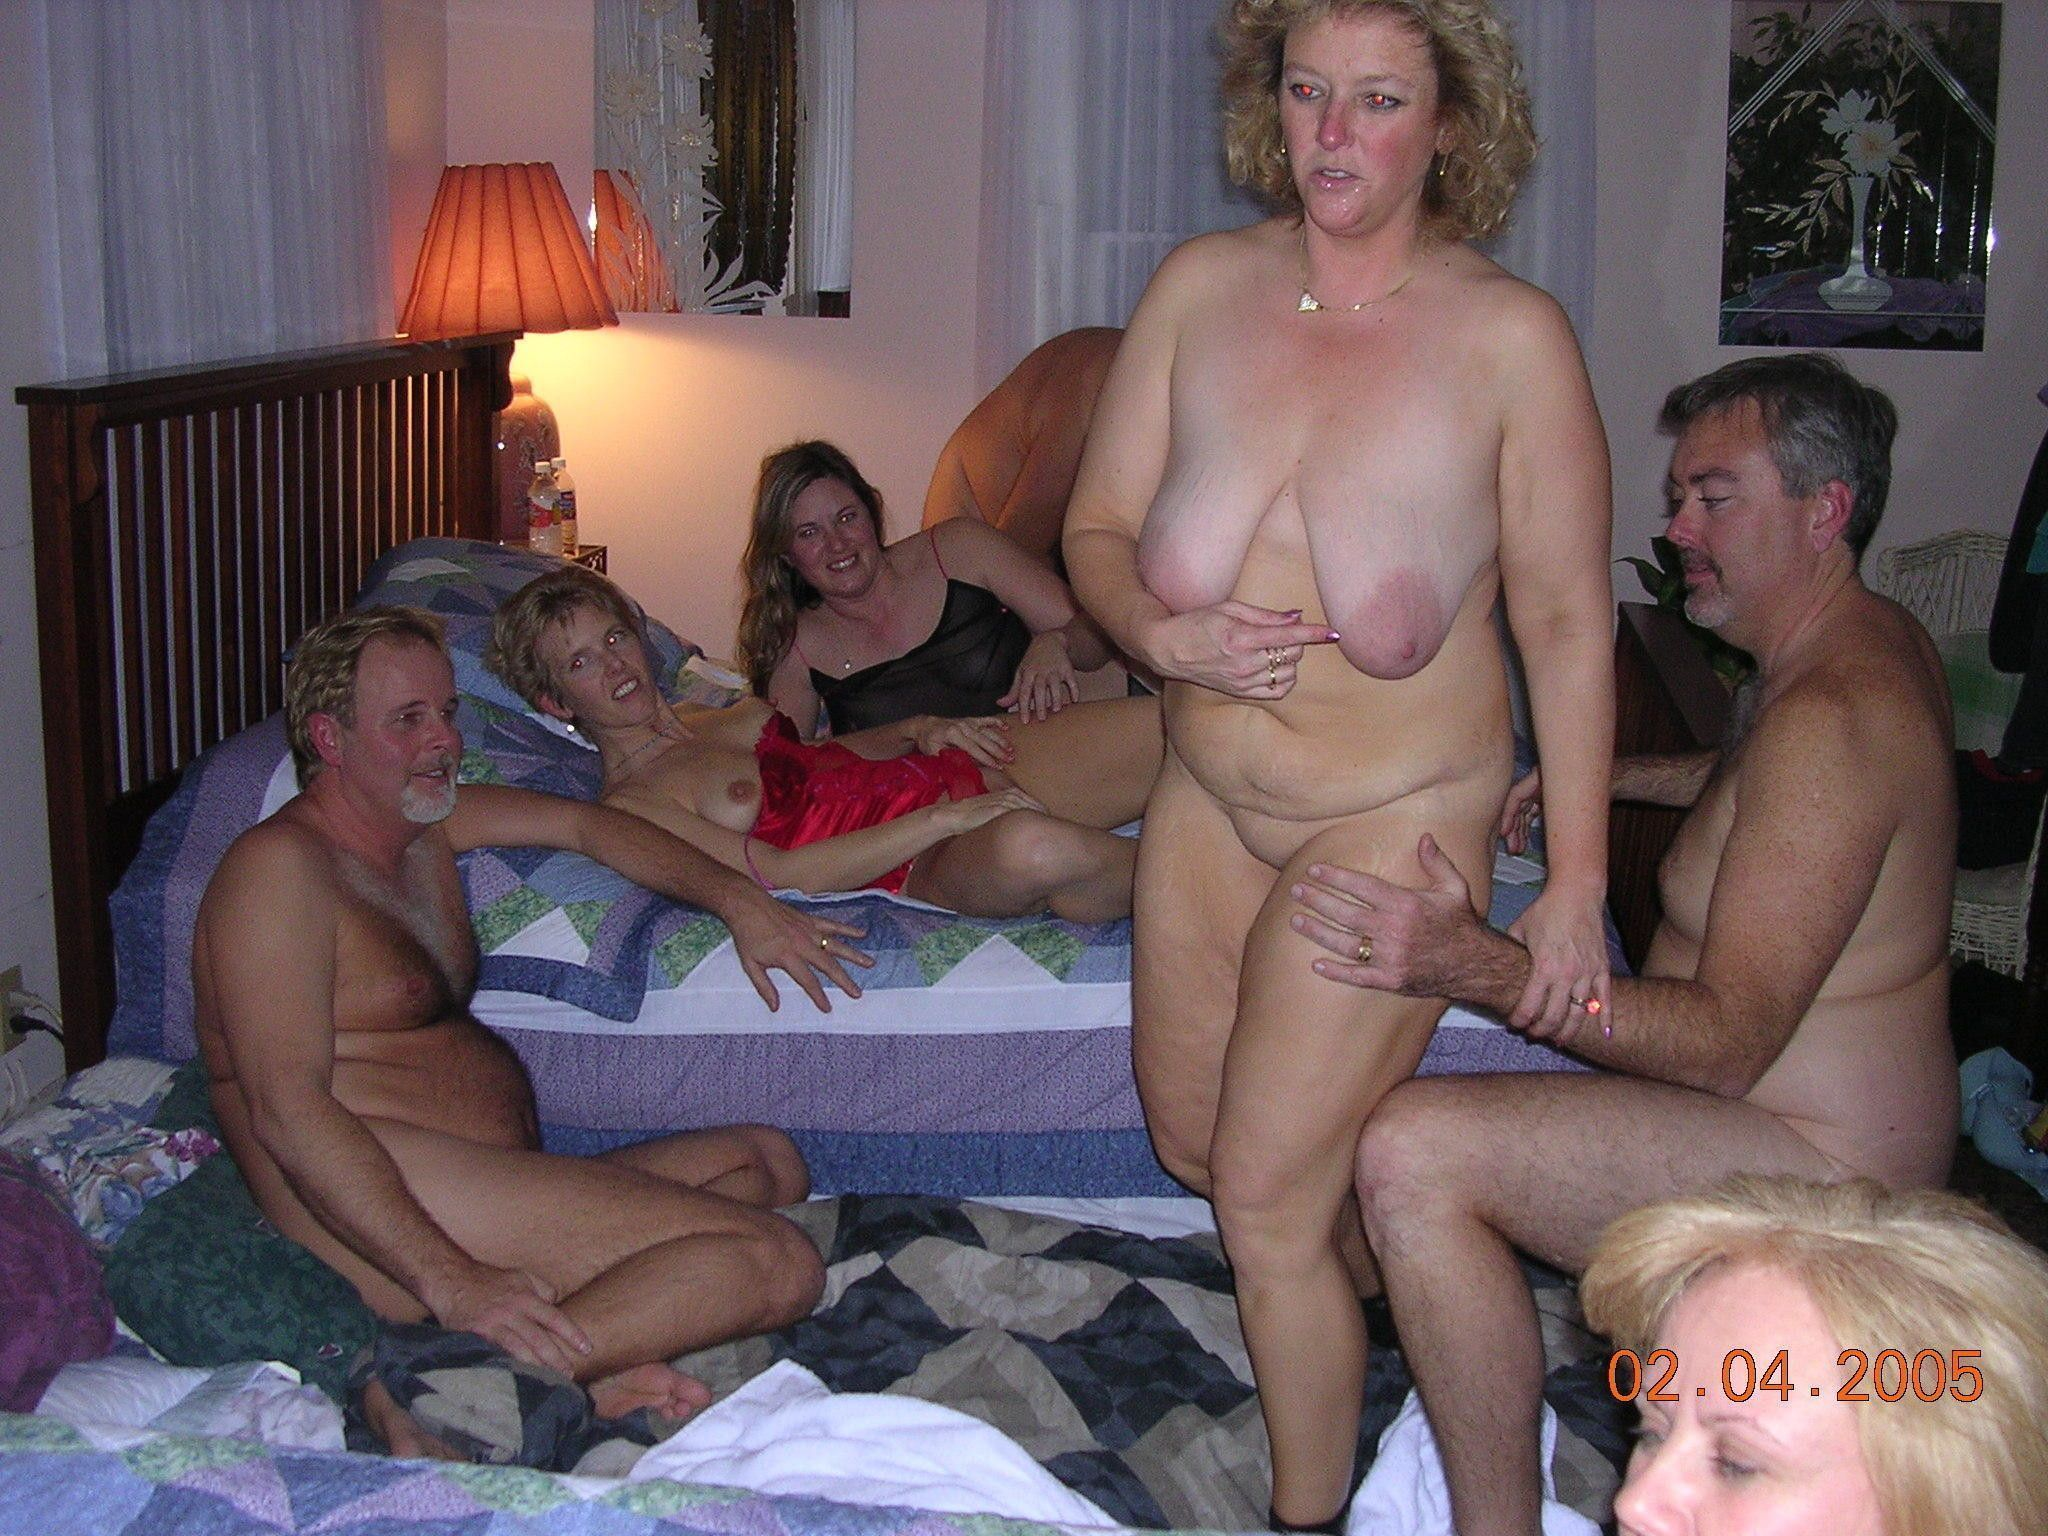 Семейное фото сэкси 10 фотография